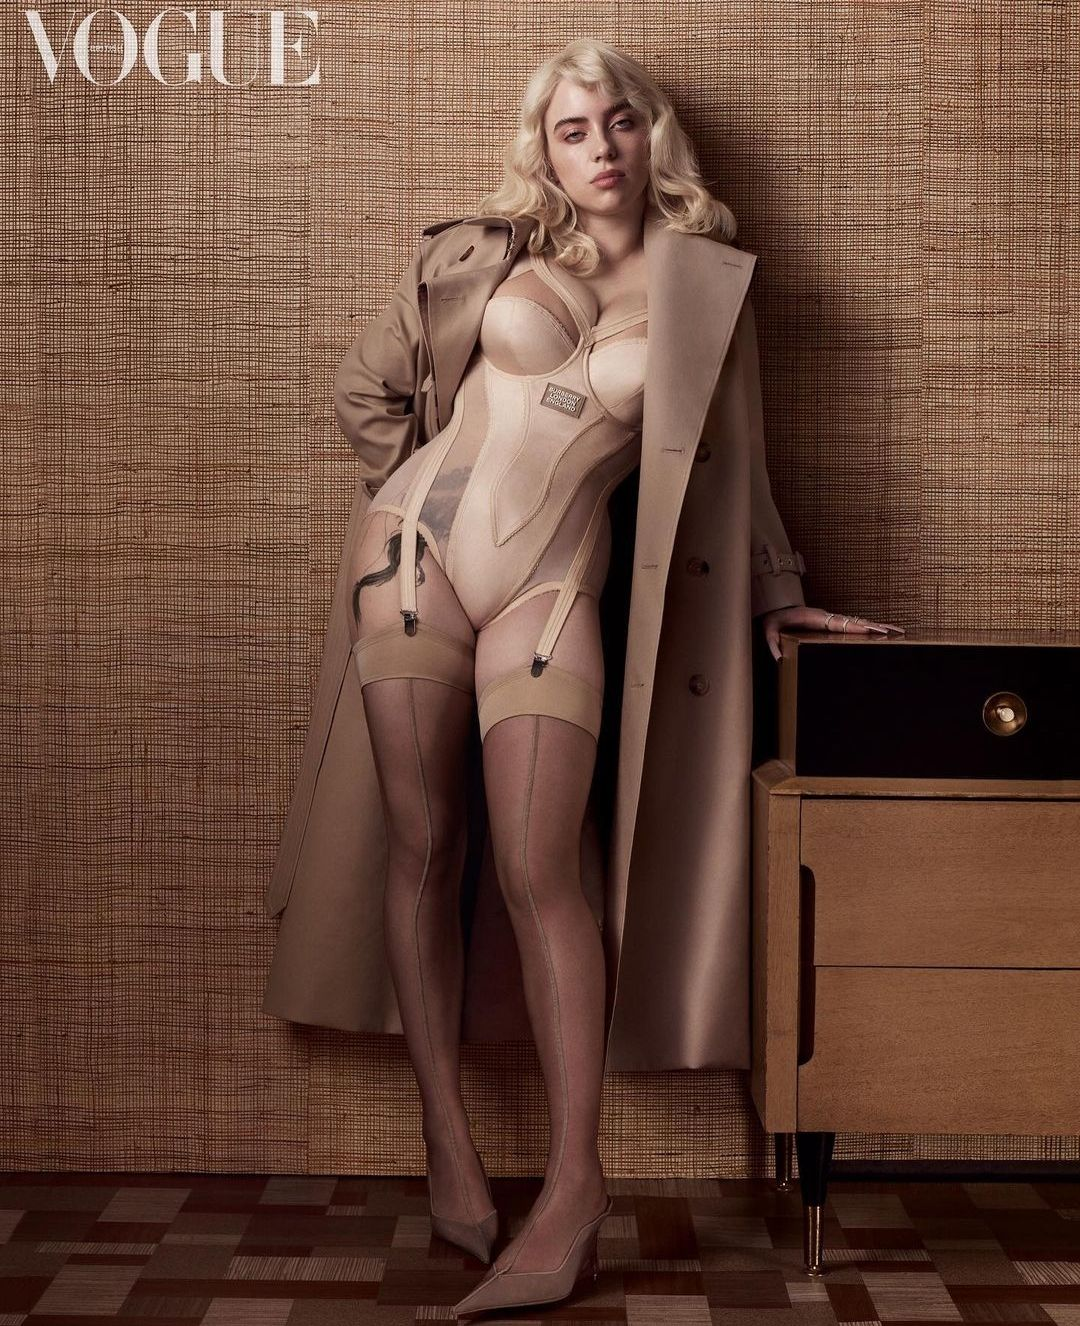 Billie Eilish tampil seksi di majalah Vogue Inggris.